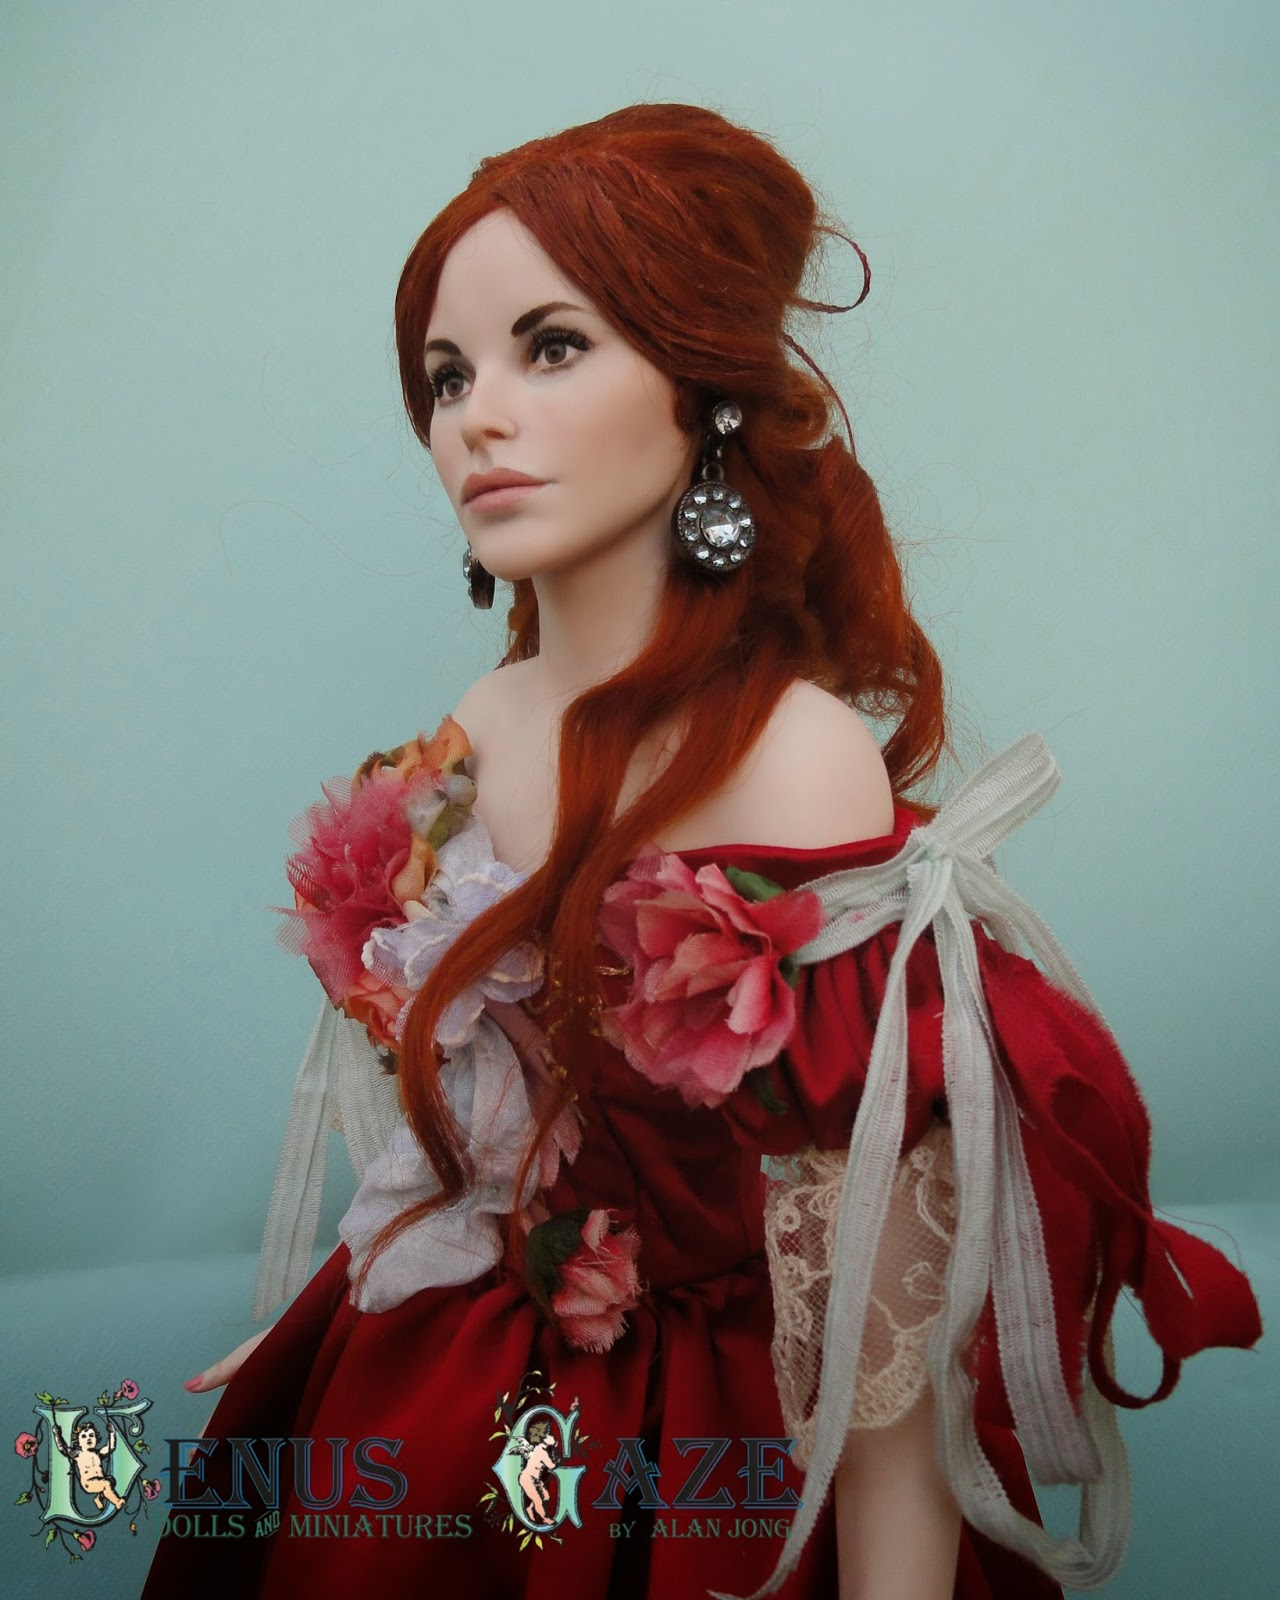 Venus Gaze Miniature Doll Art: Creative Comfort Zones ...